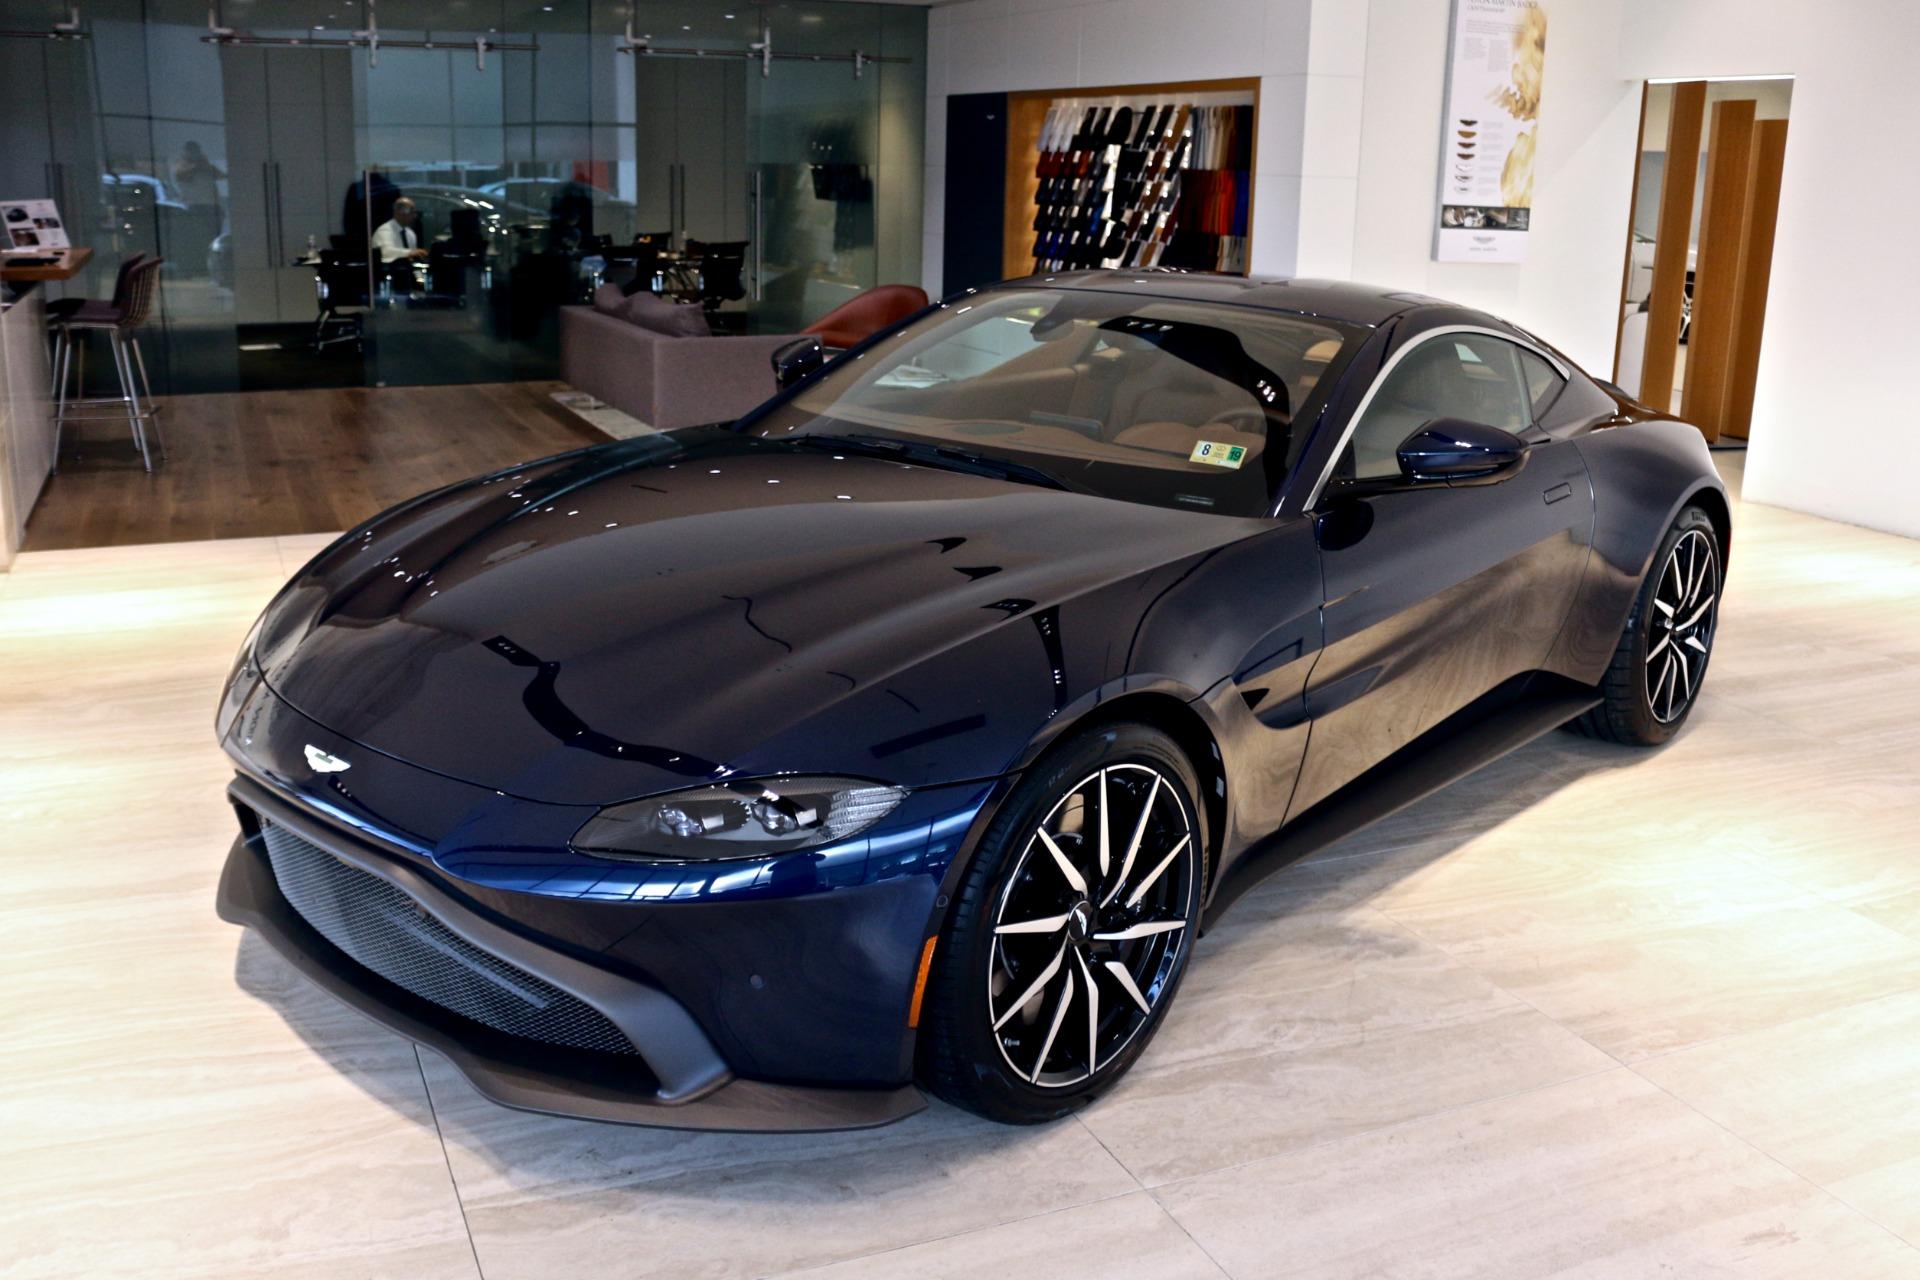 2019 Aston Martin Vantage Stock 9nn00297 For Sale Near Vienna Va Va Aston Martin Dealer For Sale In Vienna Va 9nn00297 Exclusive Automotive Group